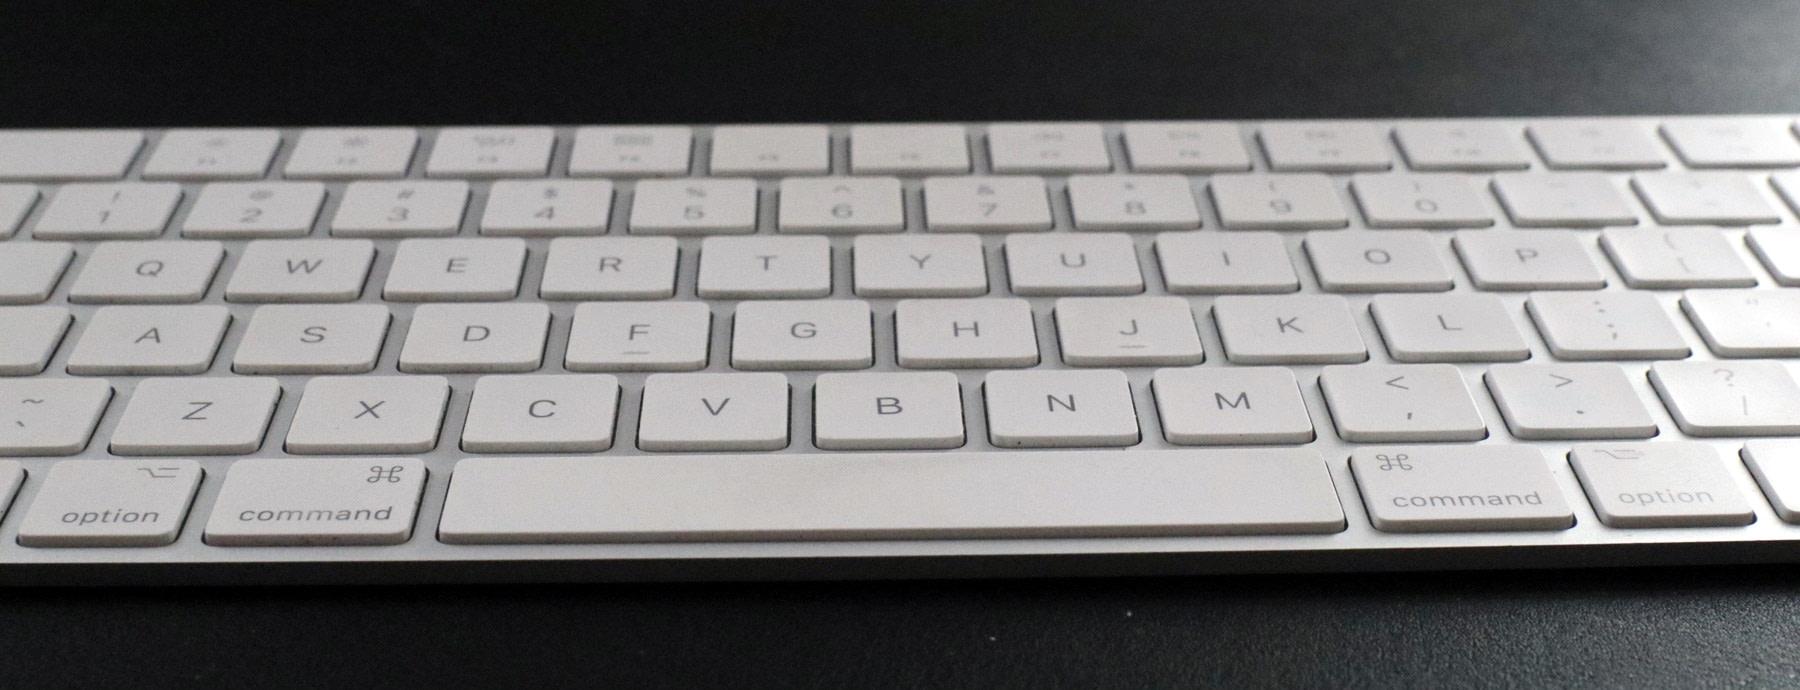 magic keyboard 5